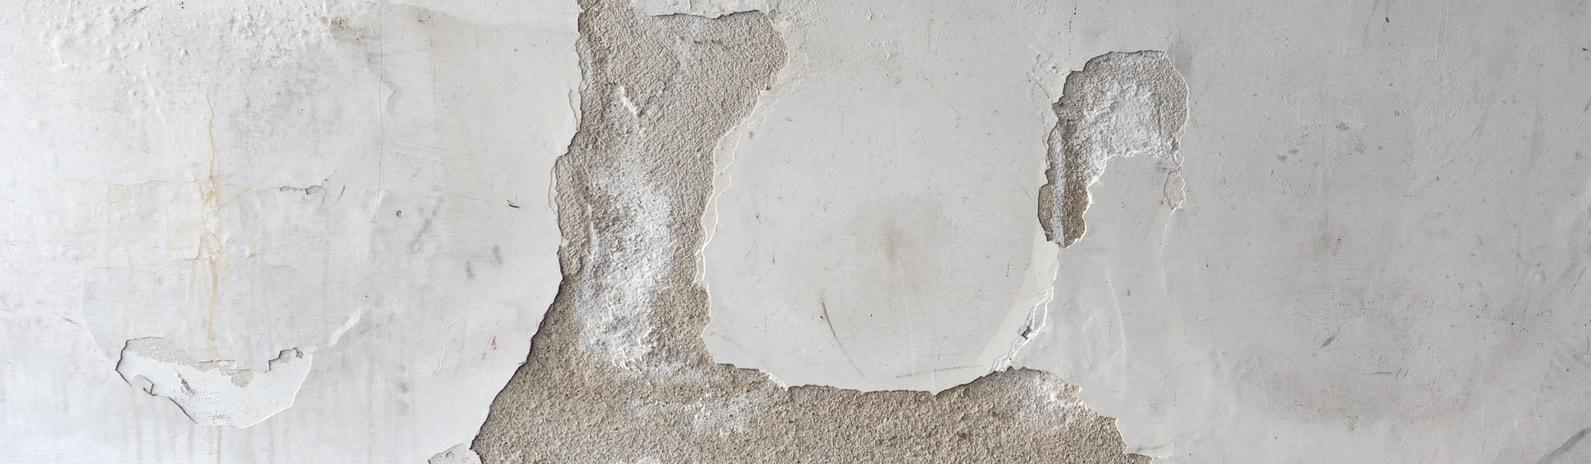 preventivo-trattamento-umidita-muri-Varese